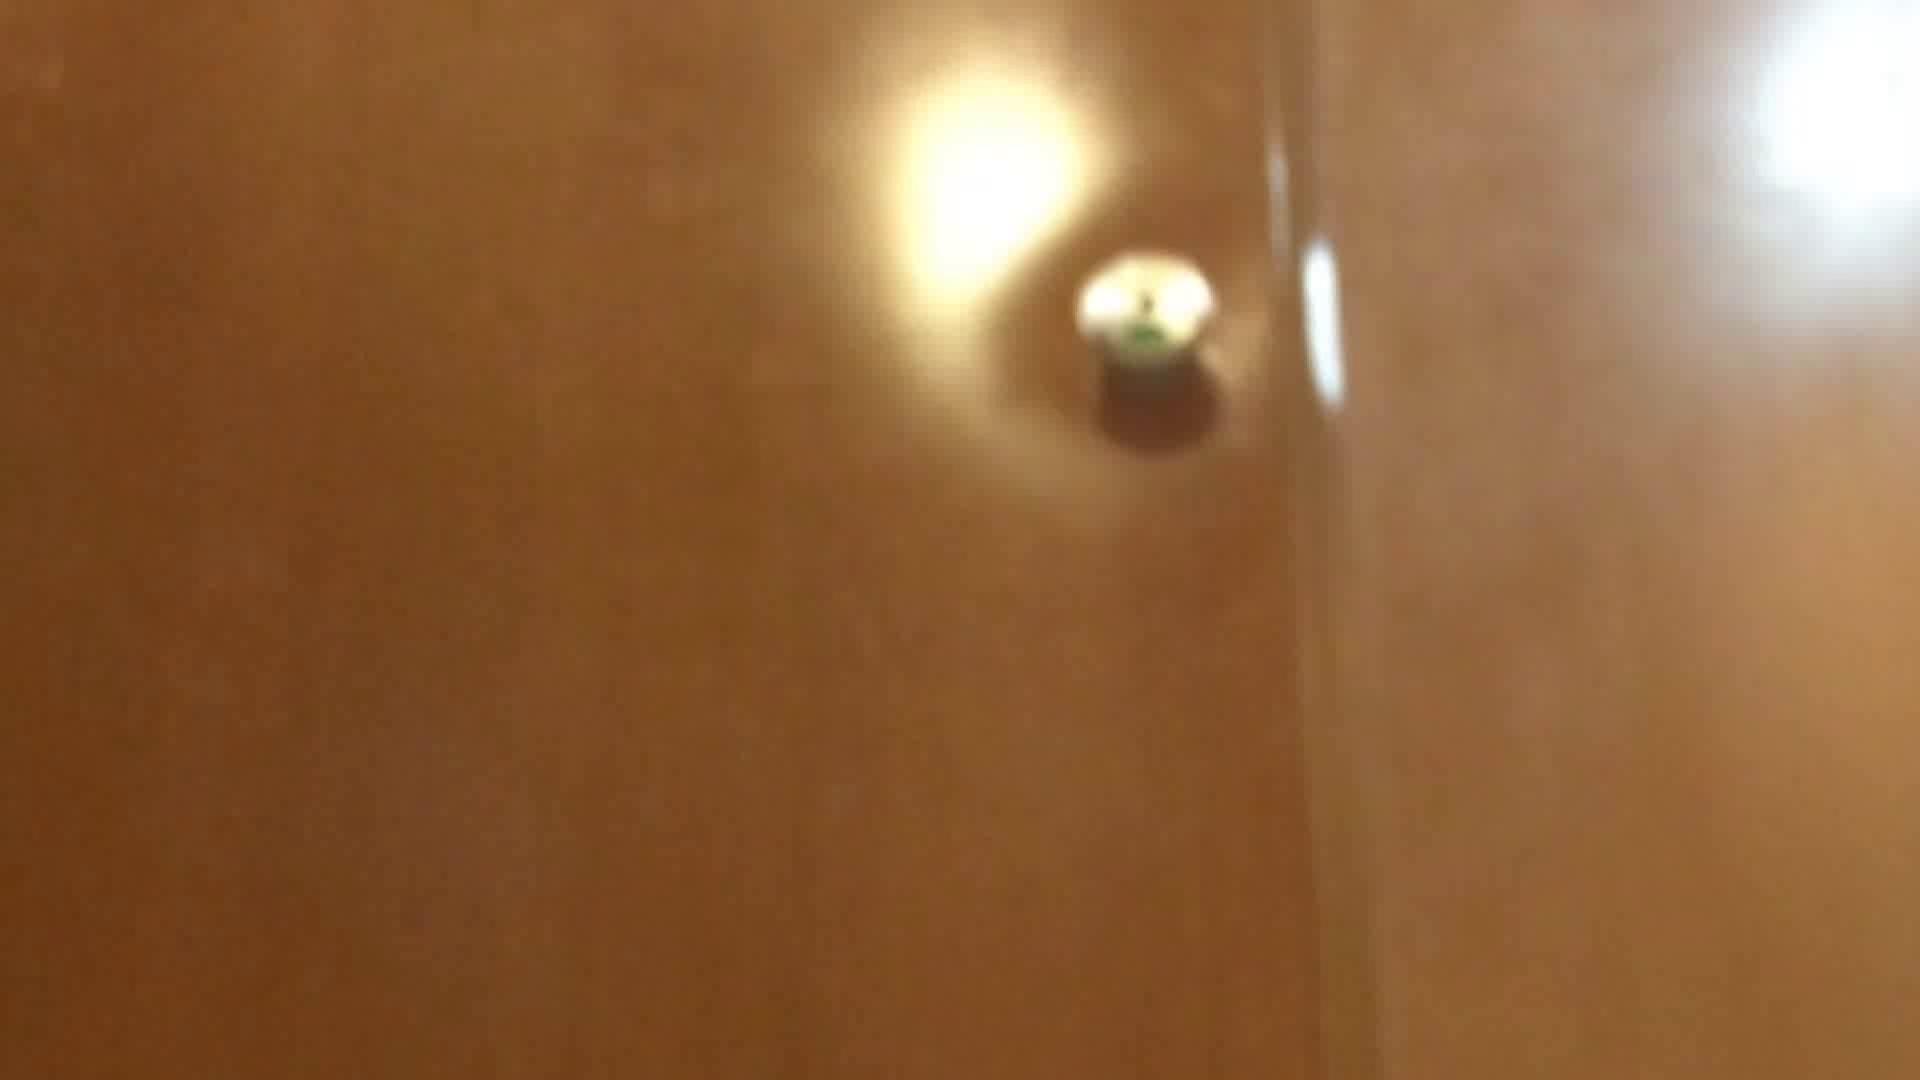 隣国化粧室下から御免!! No.15 洗面所 | 美女H映像  103画像 16